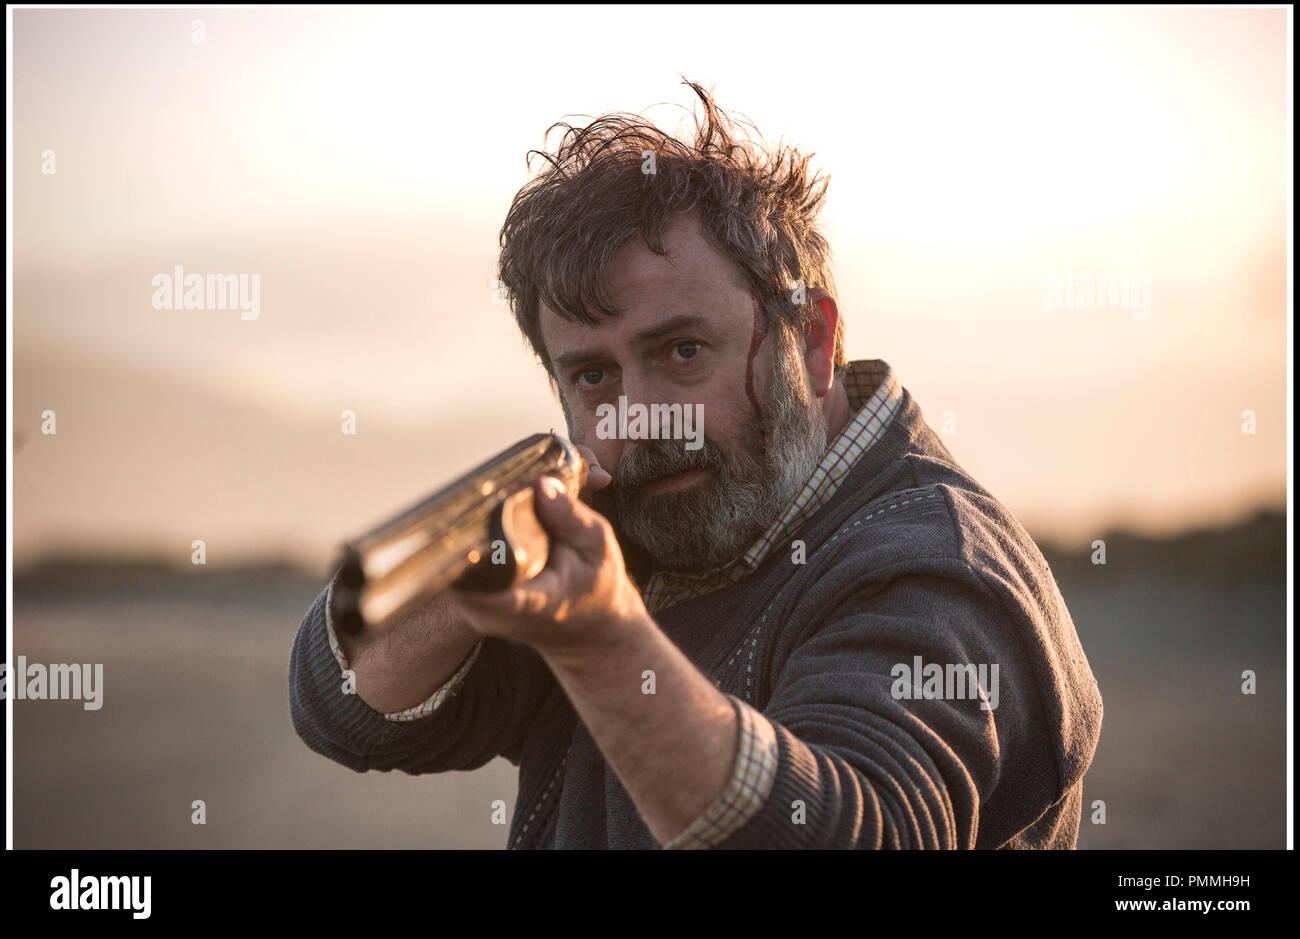 Prod Db Netflix Northern Ireland Screen Six Mile Hill Productions Xyz Films Yellowmoon Dr Bad Day For The Cut De Chris Baugh 2017 Gb Avec Nigel